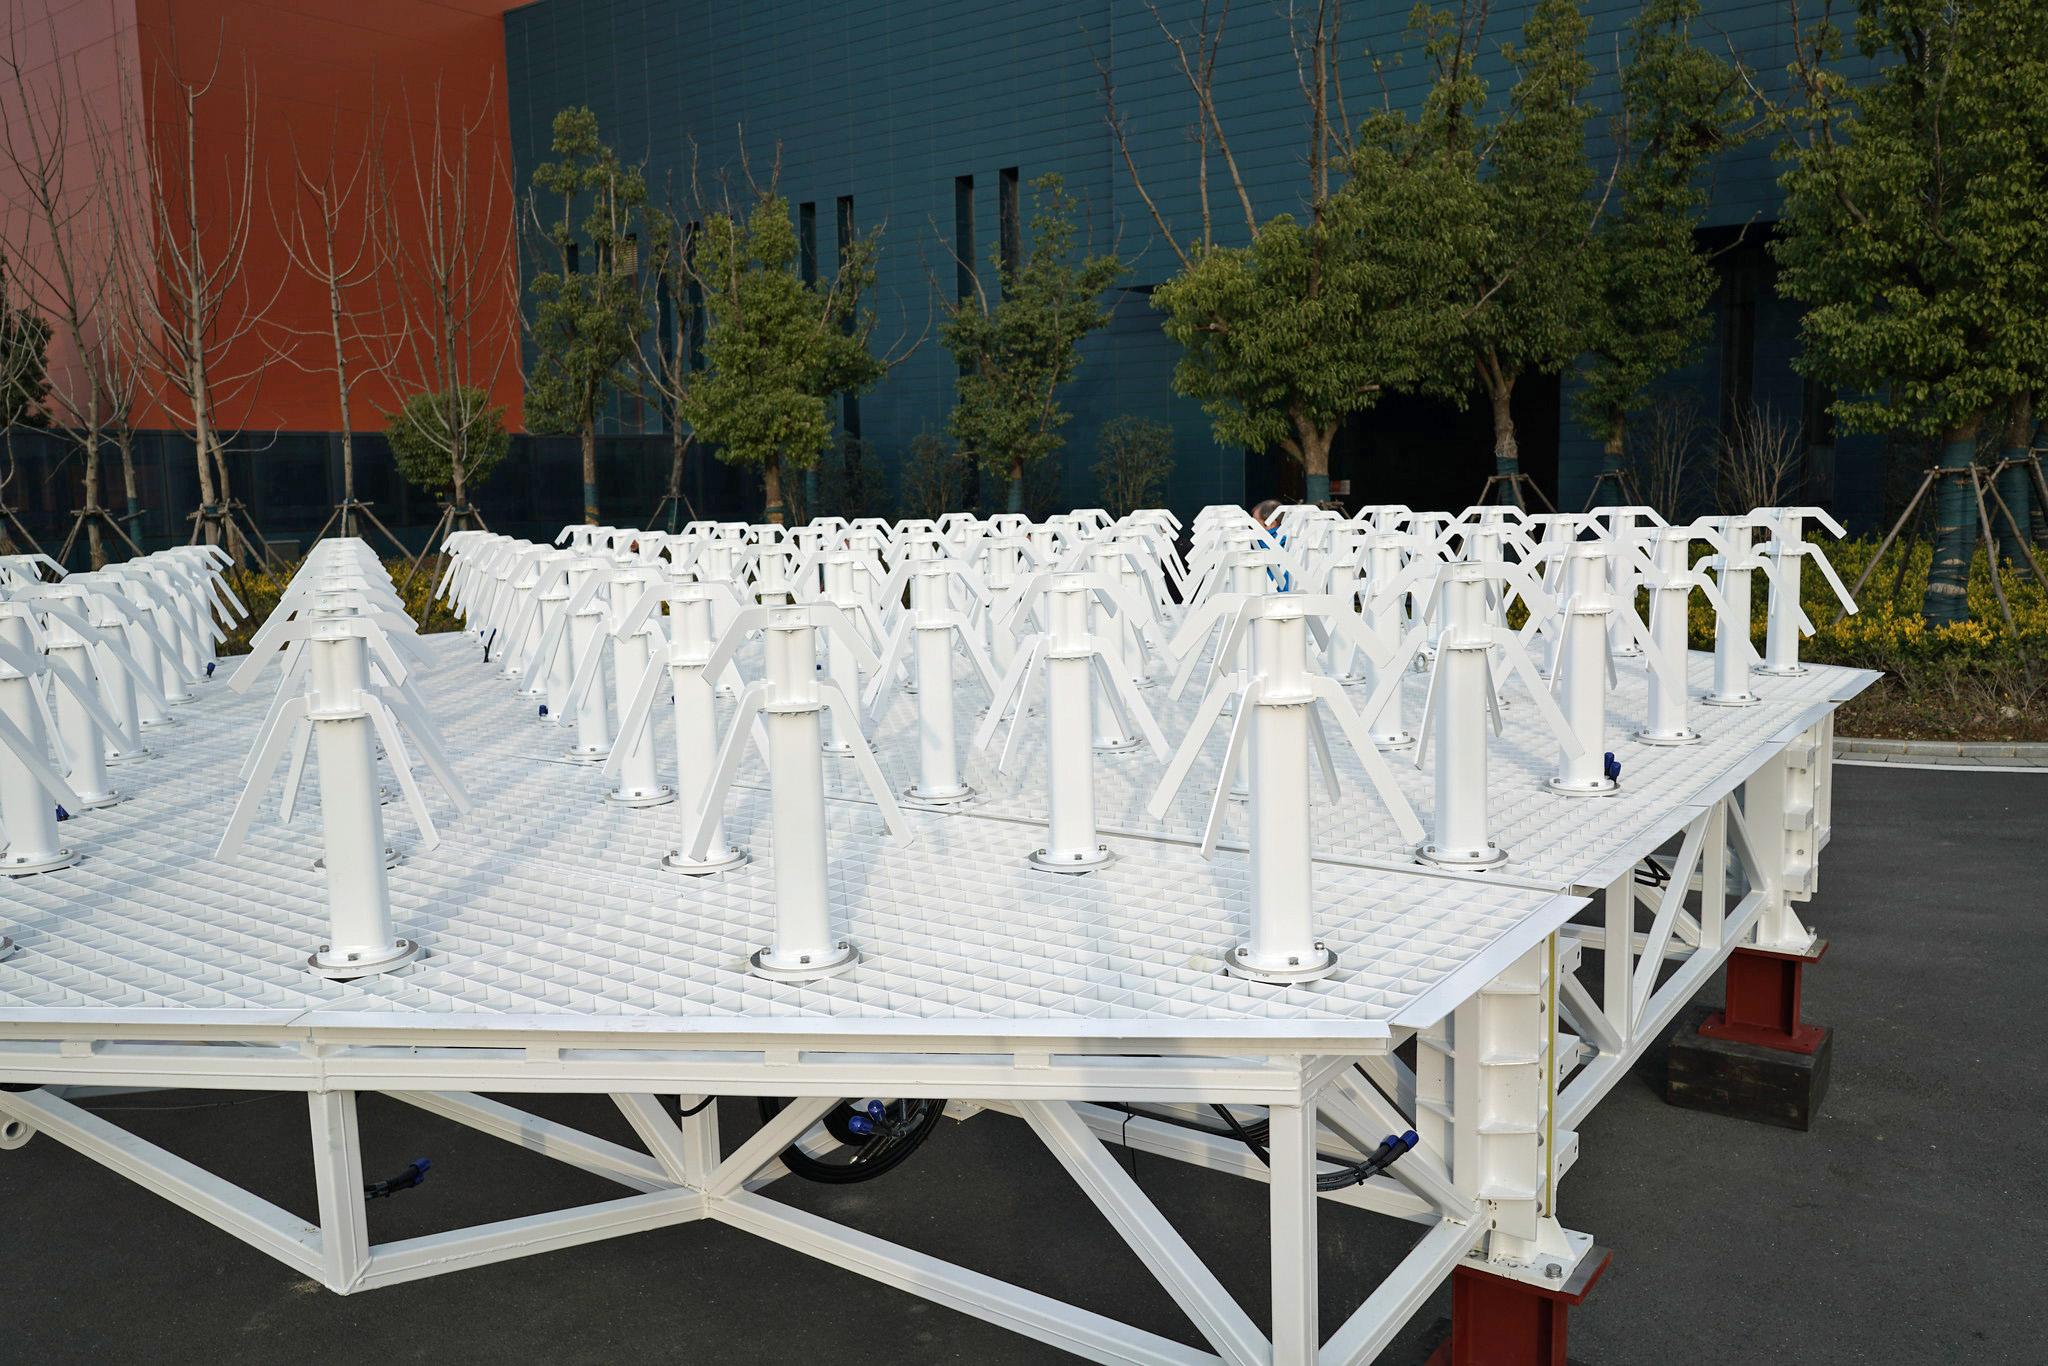 Antenna Unit Factory Visit